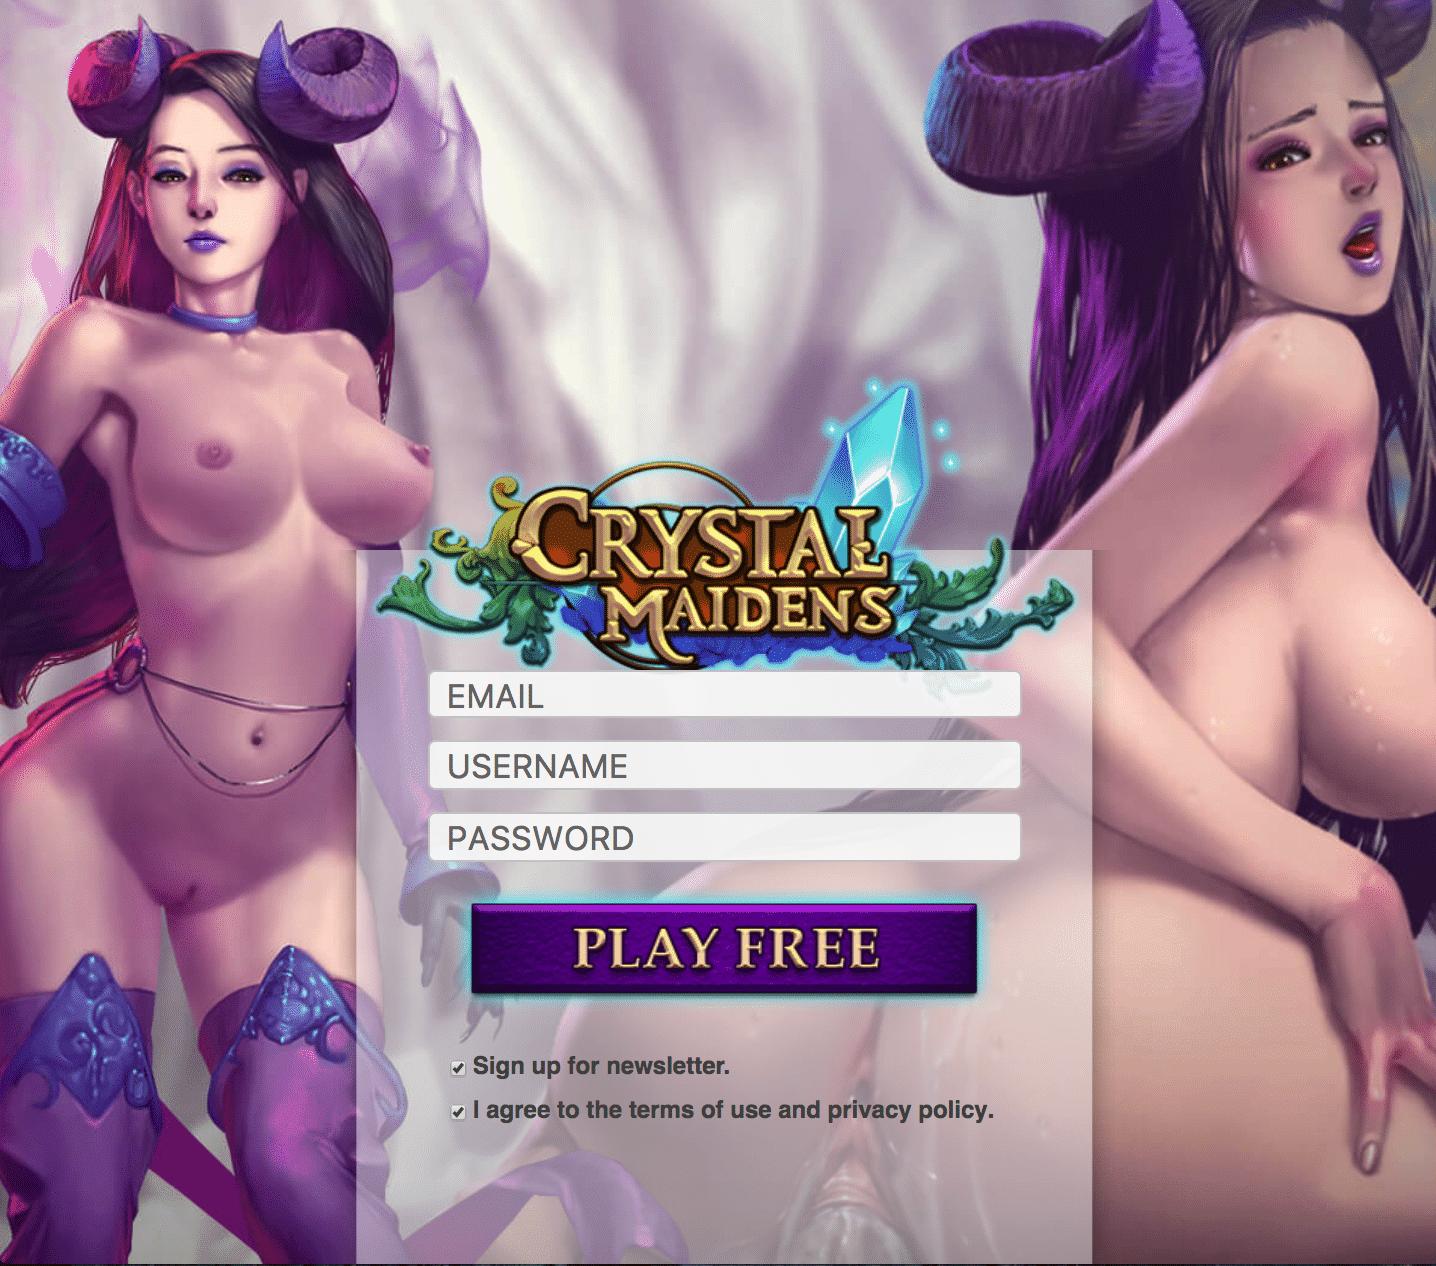 XXX Porn Games - Crystal Maidens